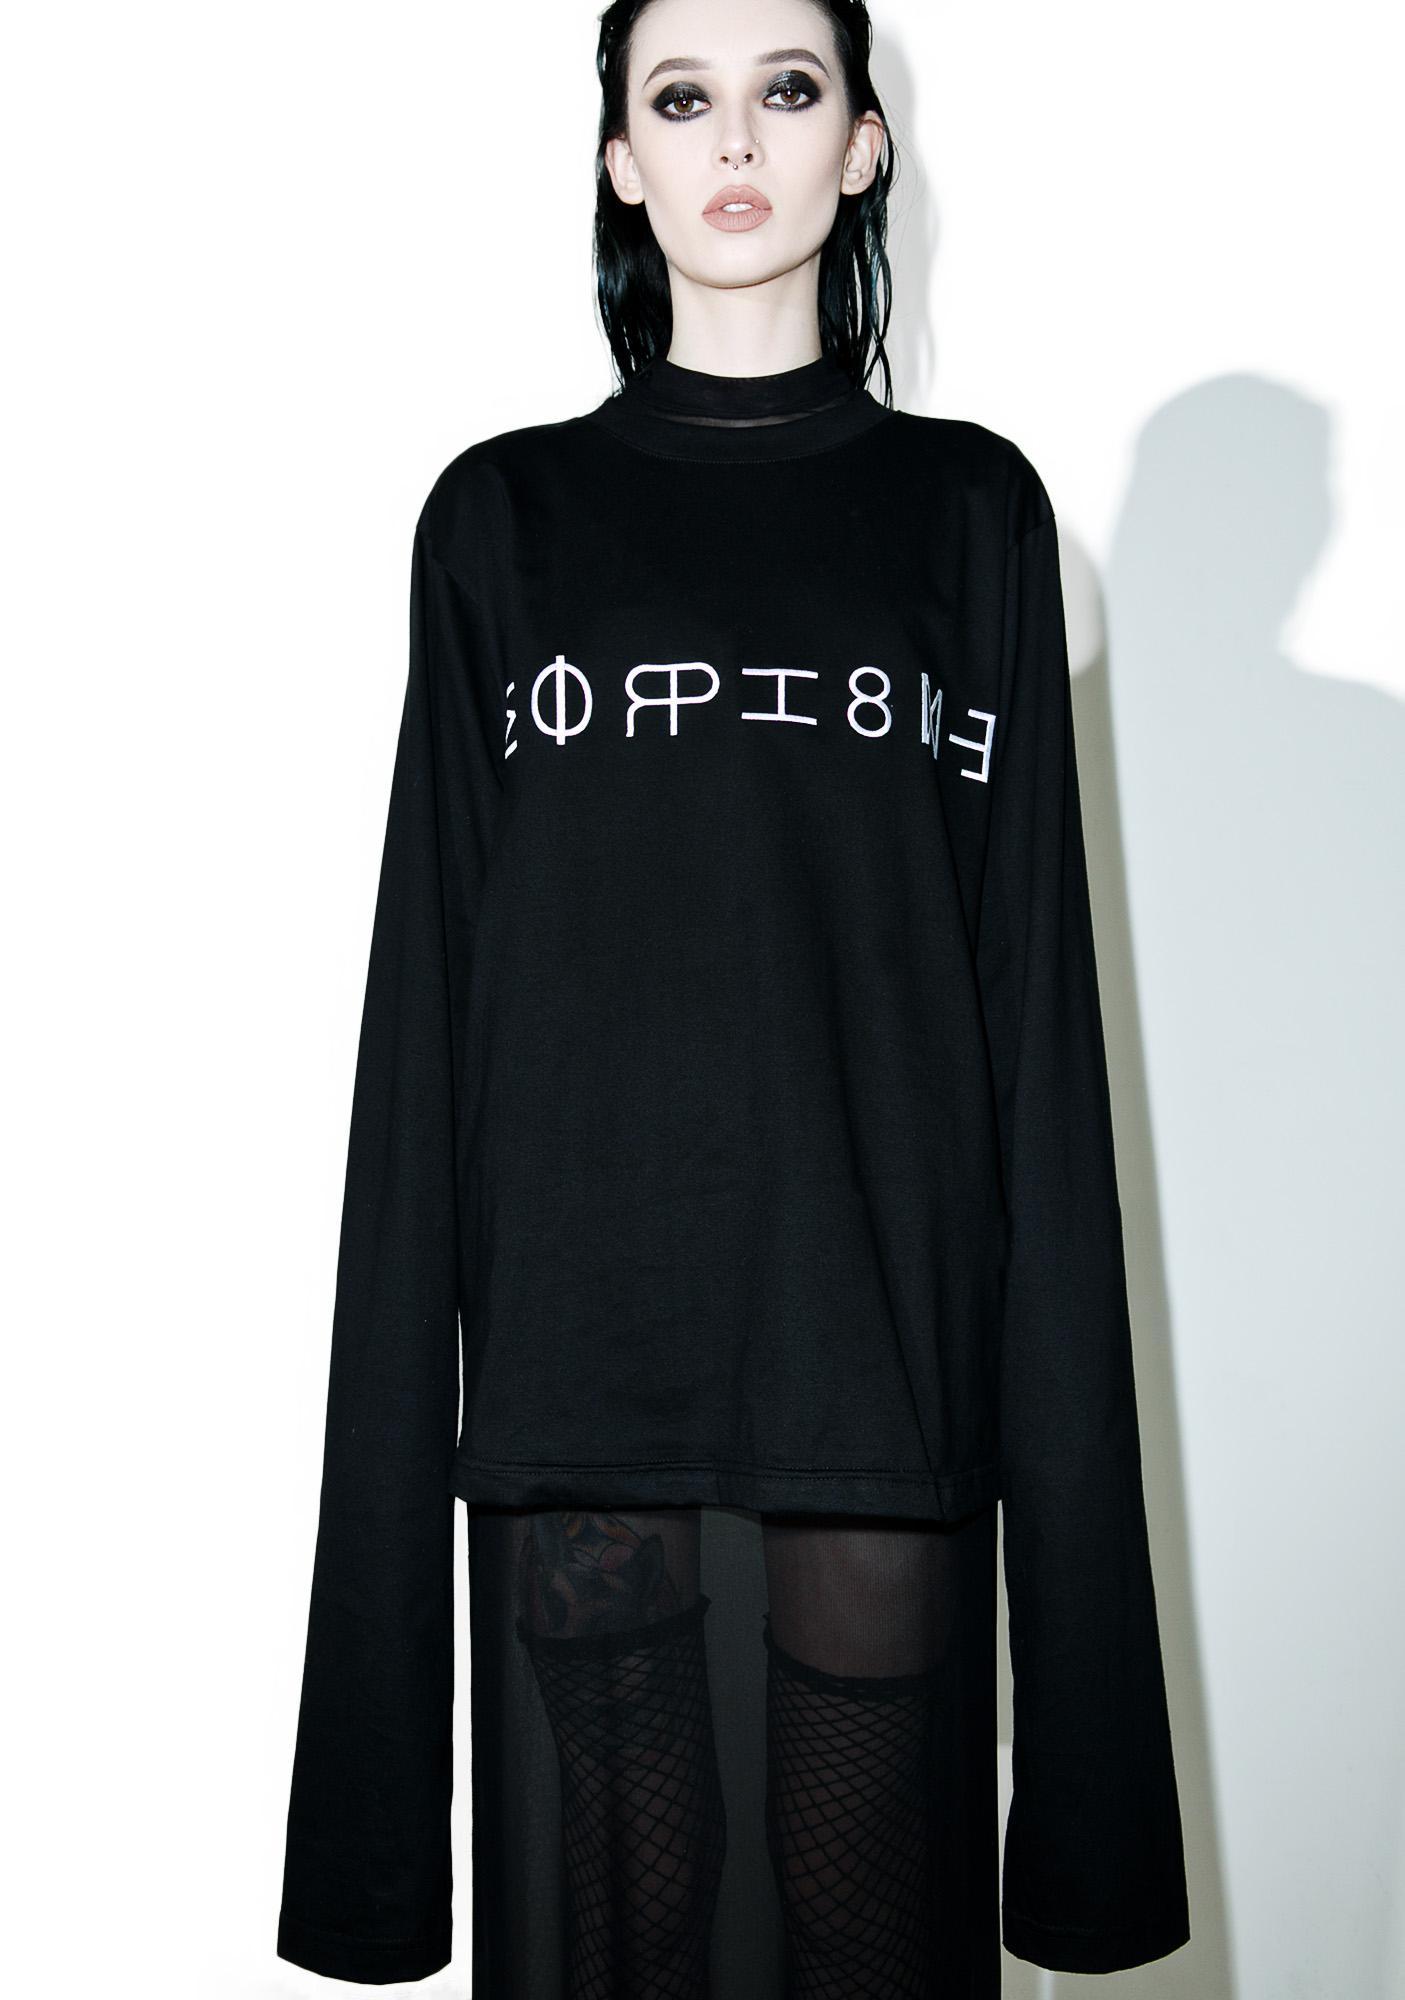 Morph8ne Controller Sweater Dolls Kill Obey Short Circuit Tshirt